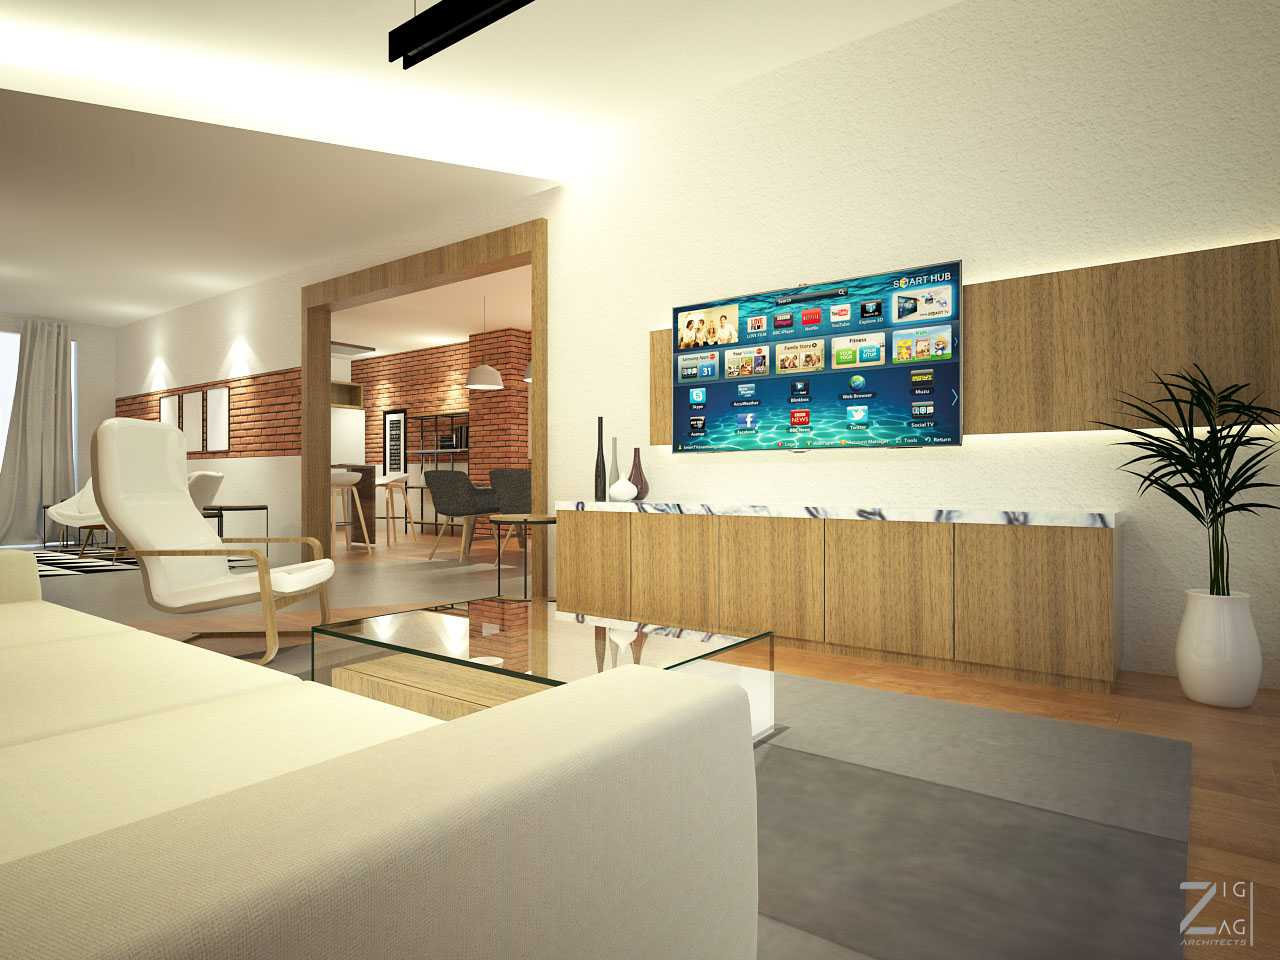 Zigzag Architecture Studio Pulomas House Daerah Khusus Ibukota Jakarta, Indonesia  Living-Room-View01   37606